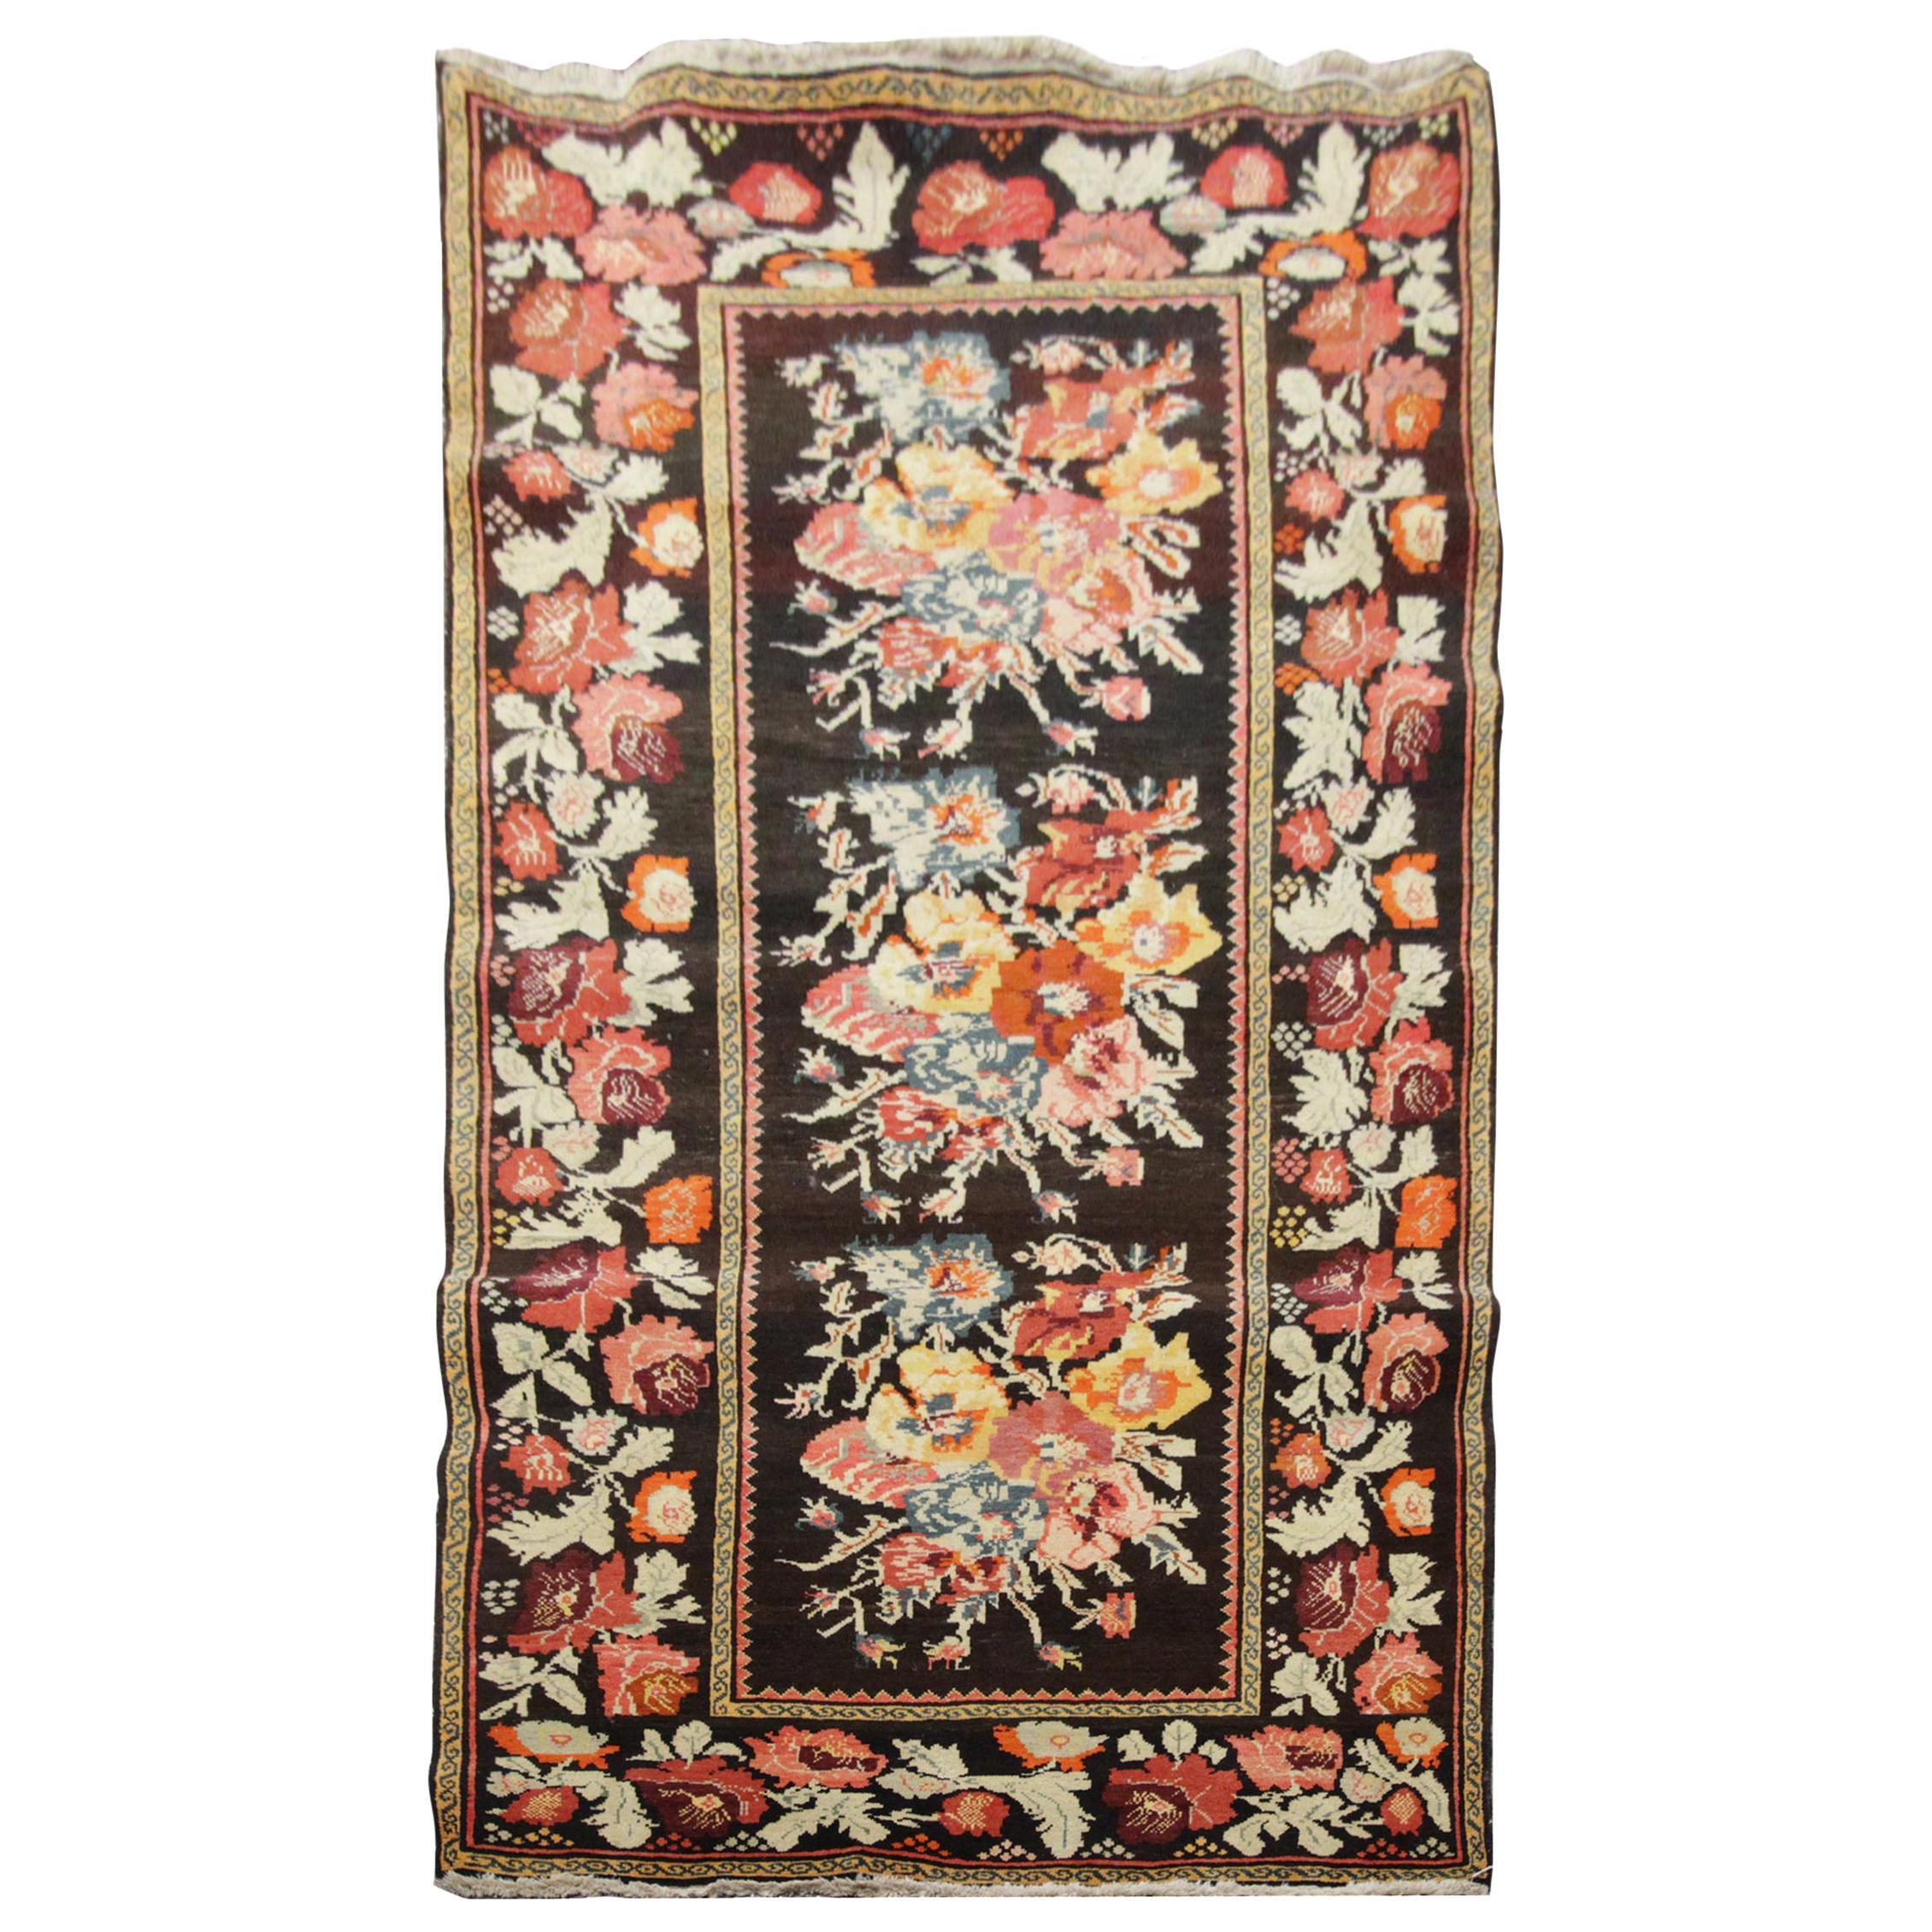 Antique Rug Caucasian Karabagh, Handmade Carpet Oriental Rug, Floral Area Rugs